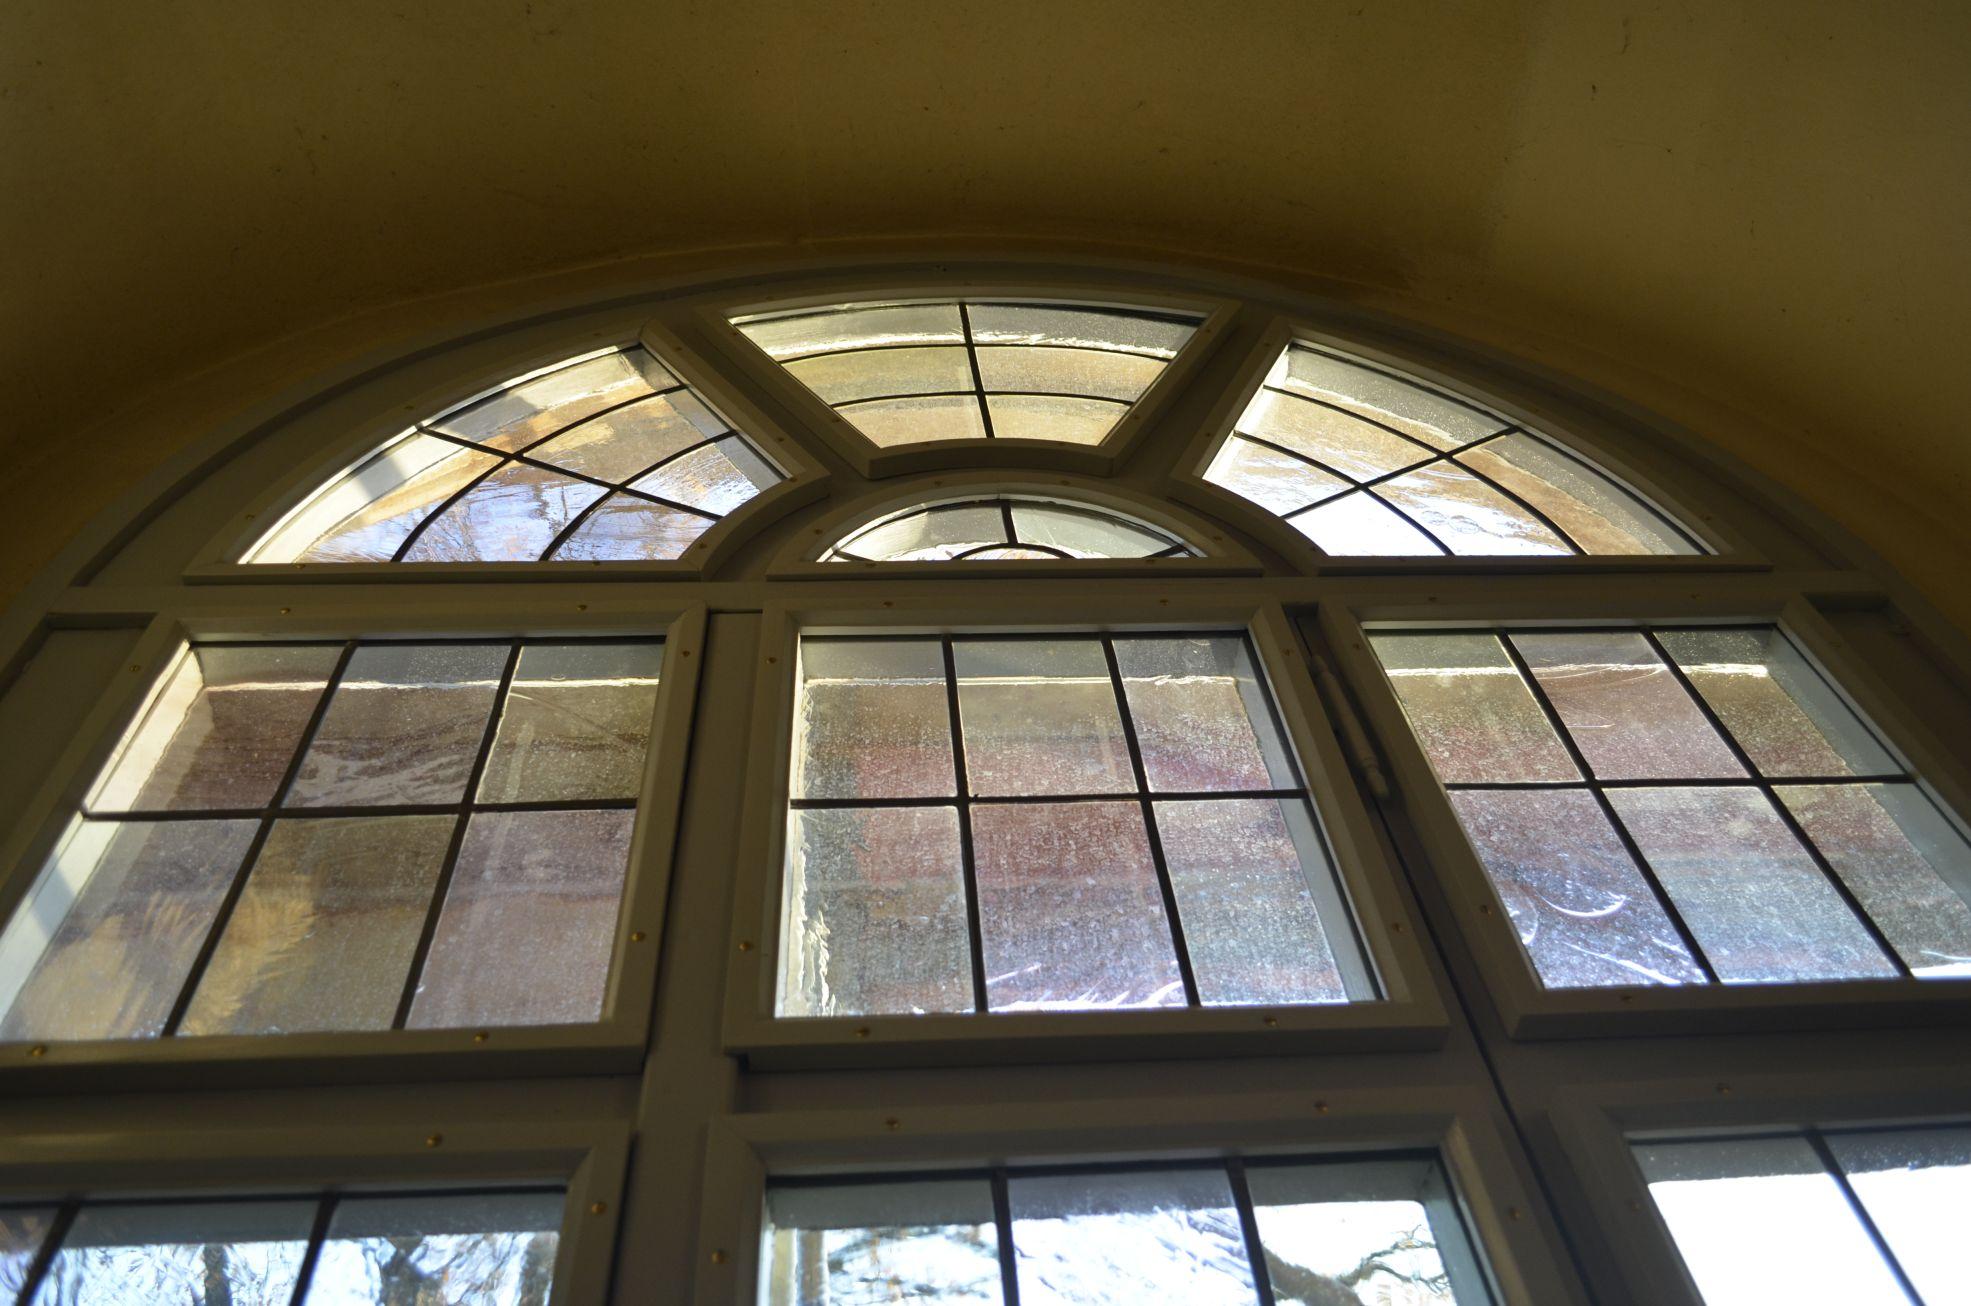 Unser aktuelles Grossprojekt:  Kirchenfenster-Restaurierung